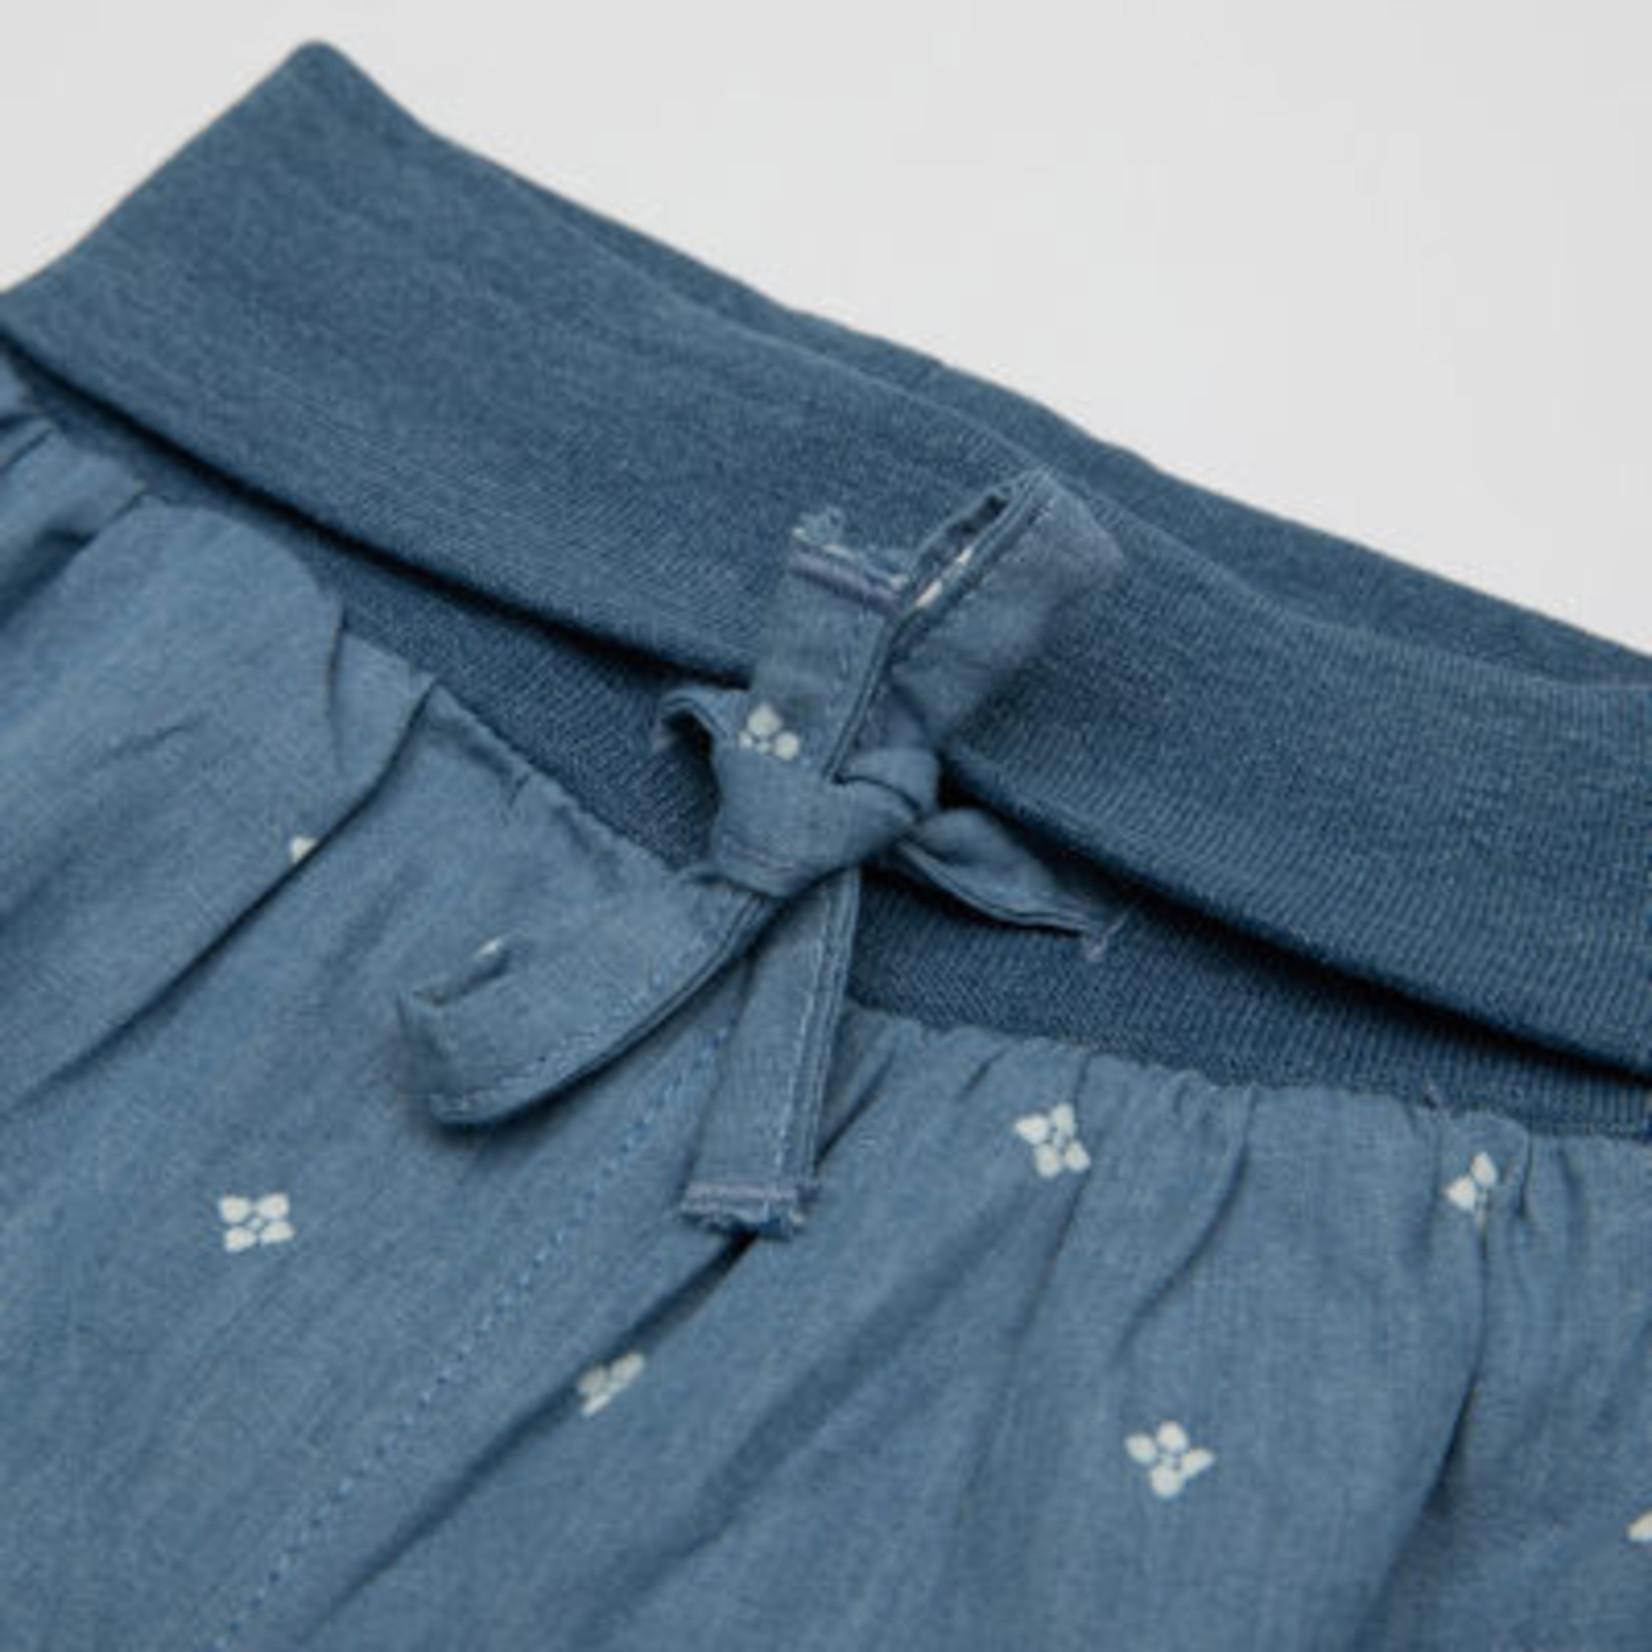 Sigikid Pofbroekje jeans met klein printje